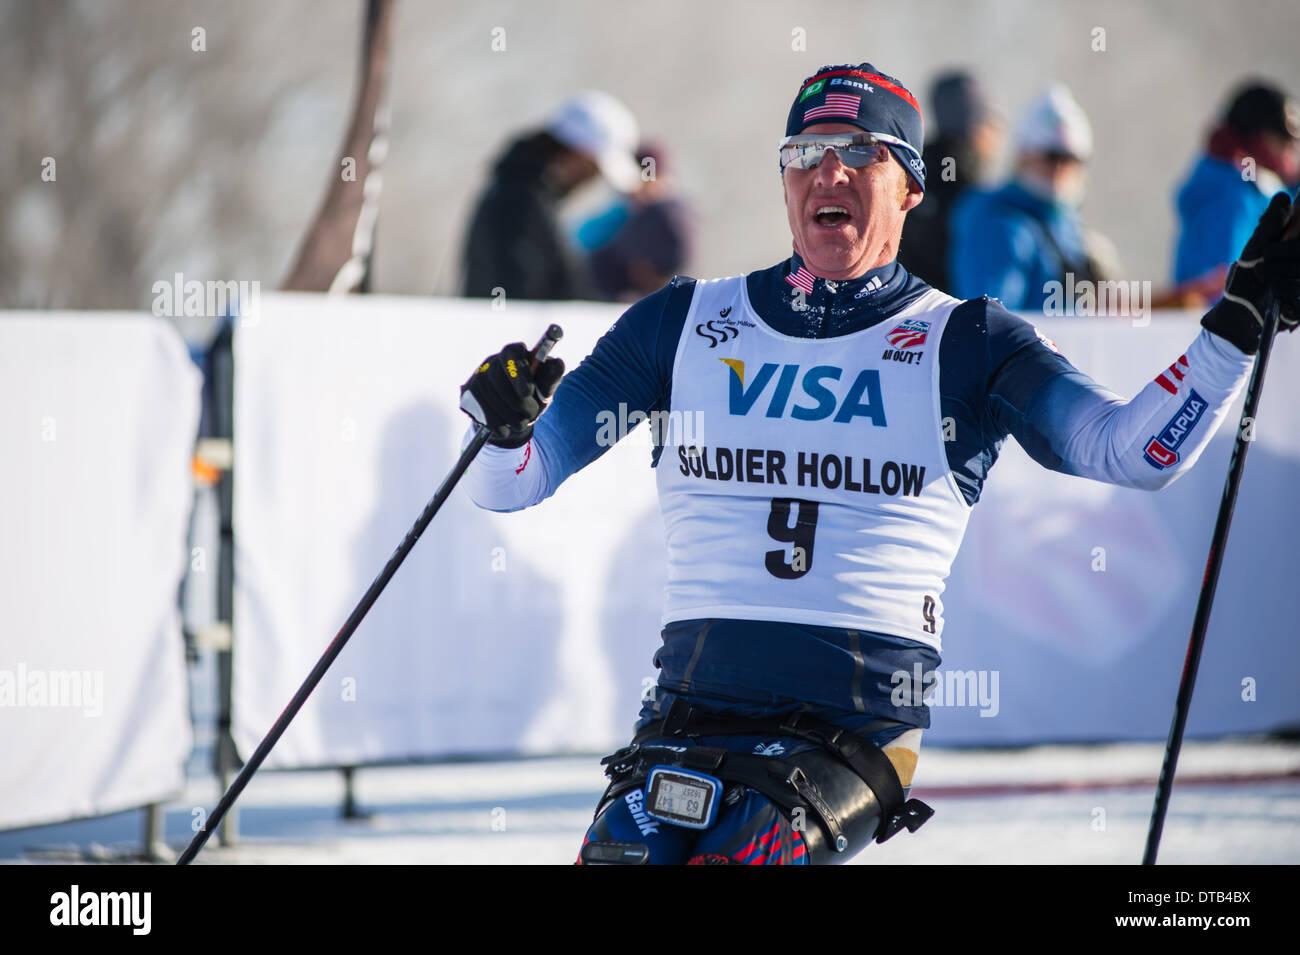 2014 U.S. Paralympics Nordic Skiing Nationals - Stock Image